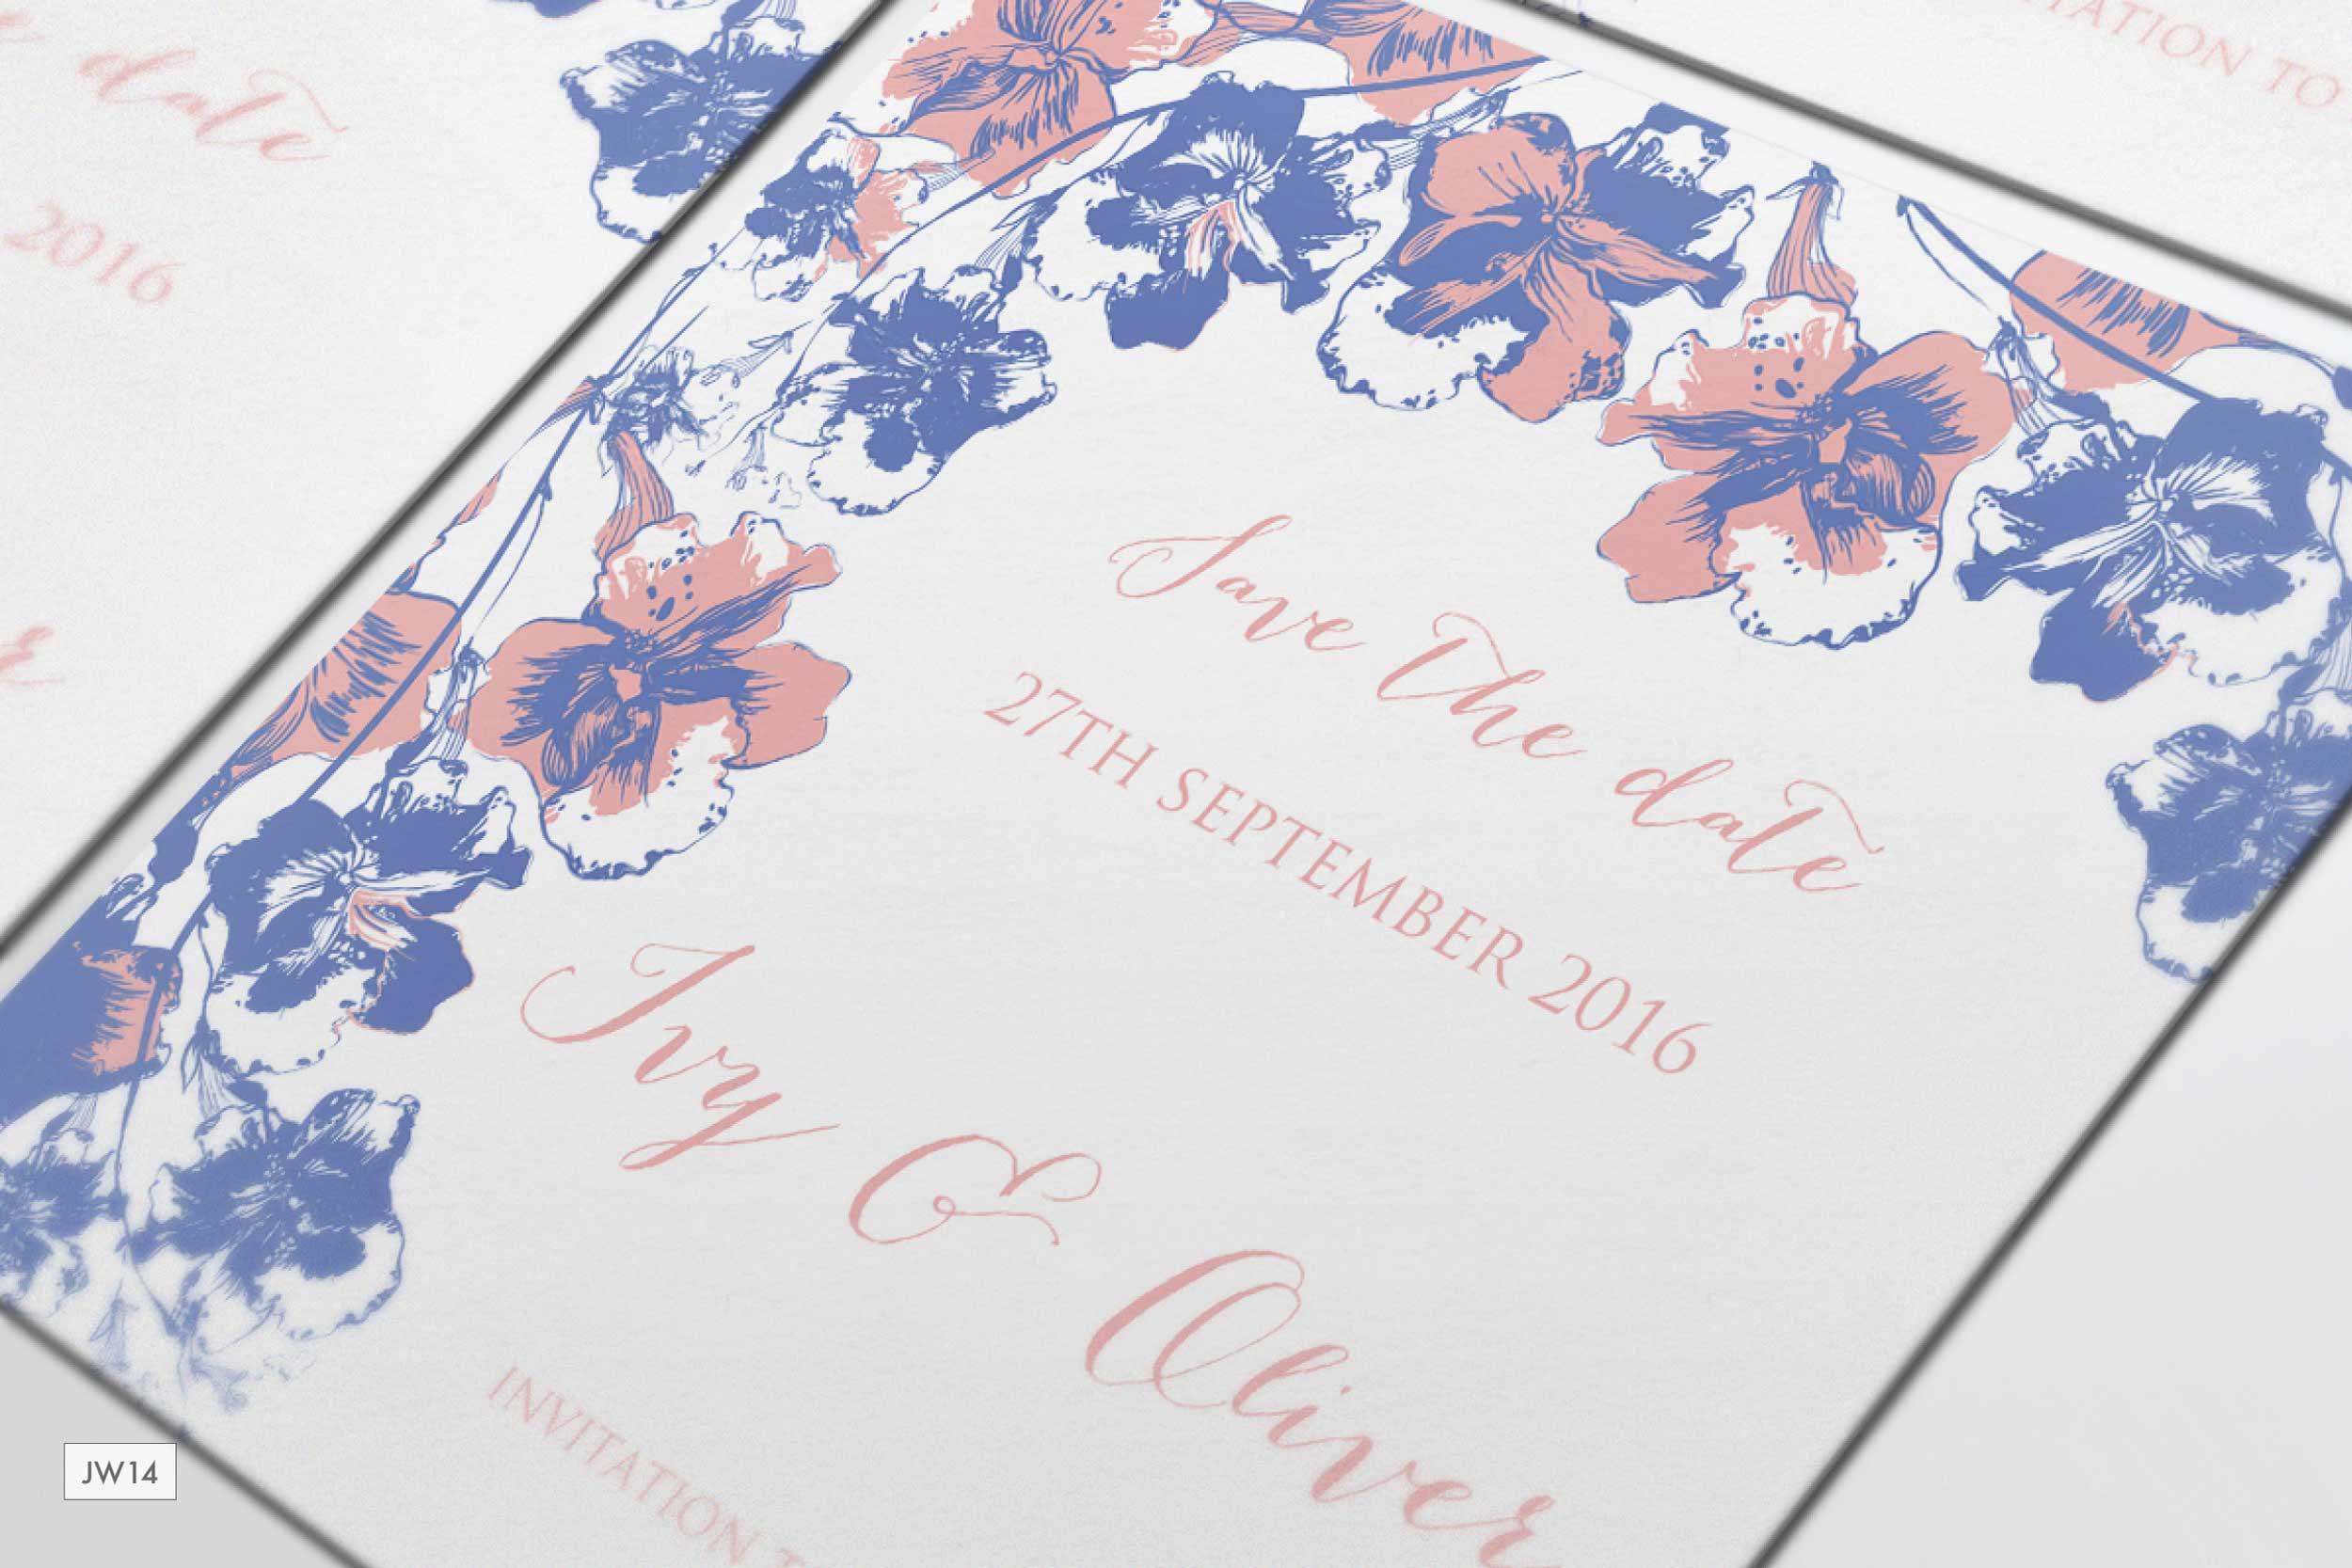 pink_blue_floral_wedding-invitation_ananyacards.com-01.jpg